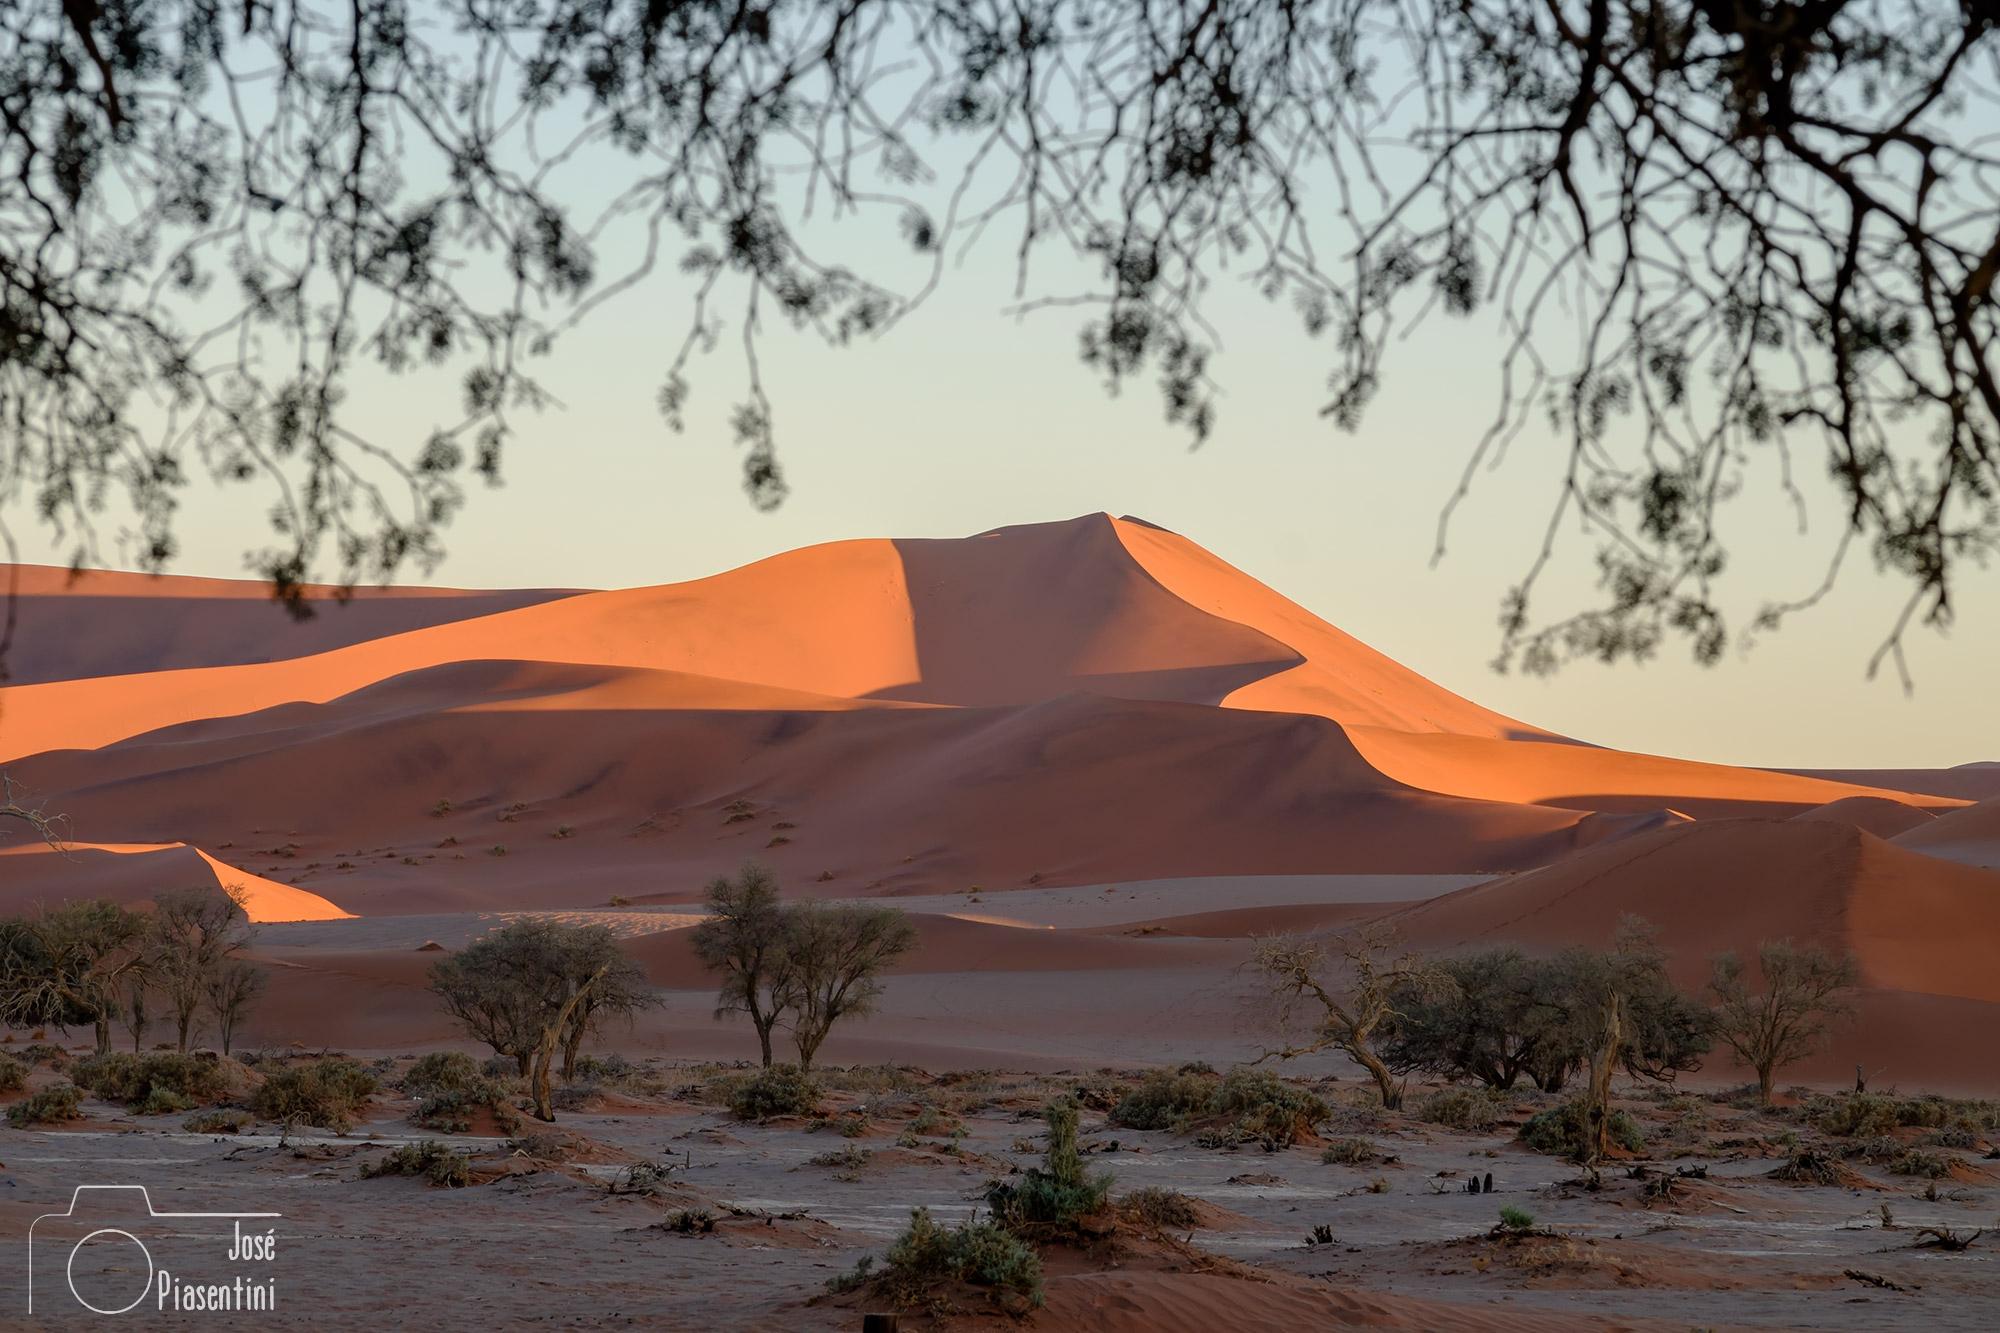 Dunes Parque-Nacional-de-Namib-Naukluft